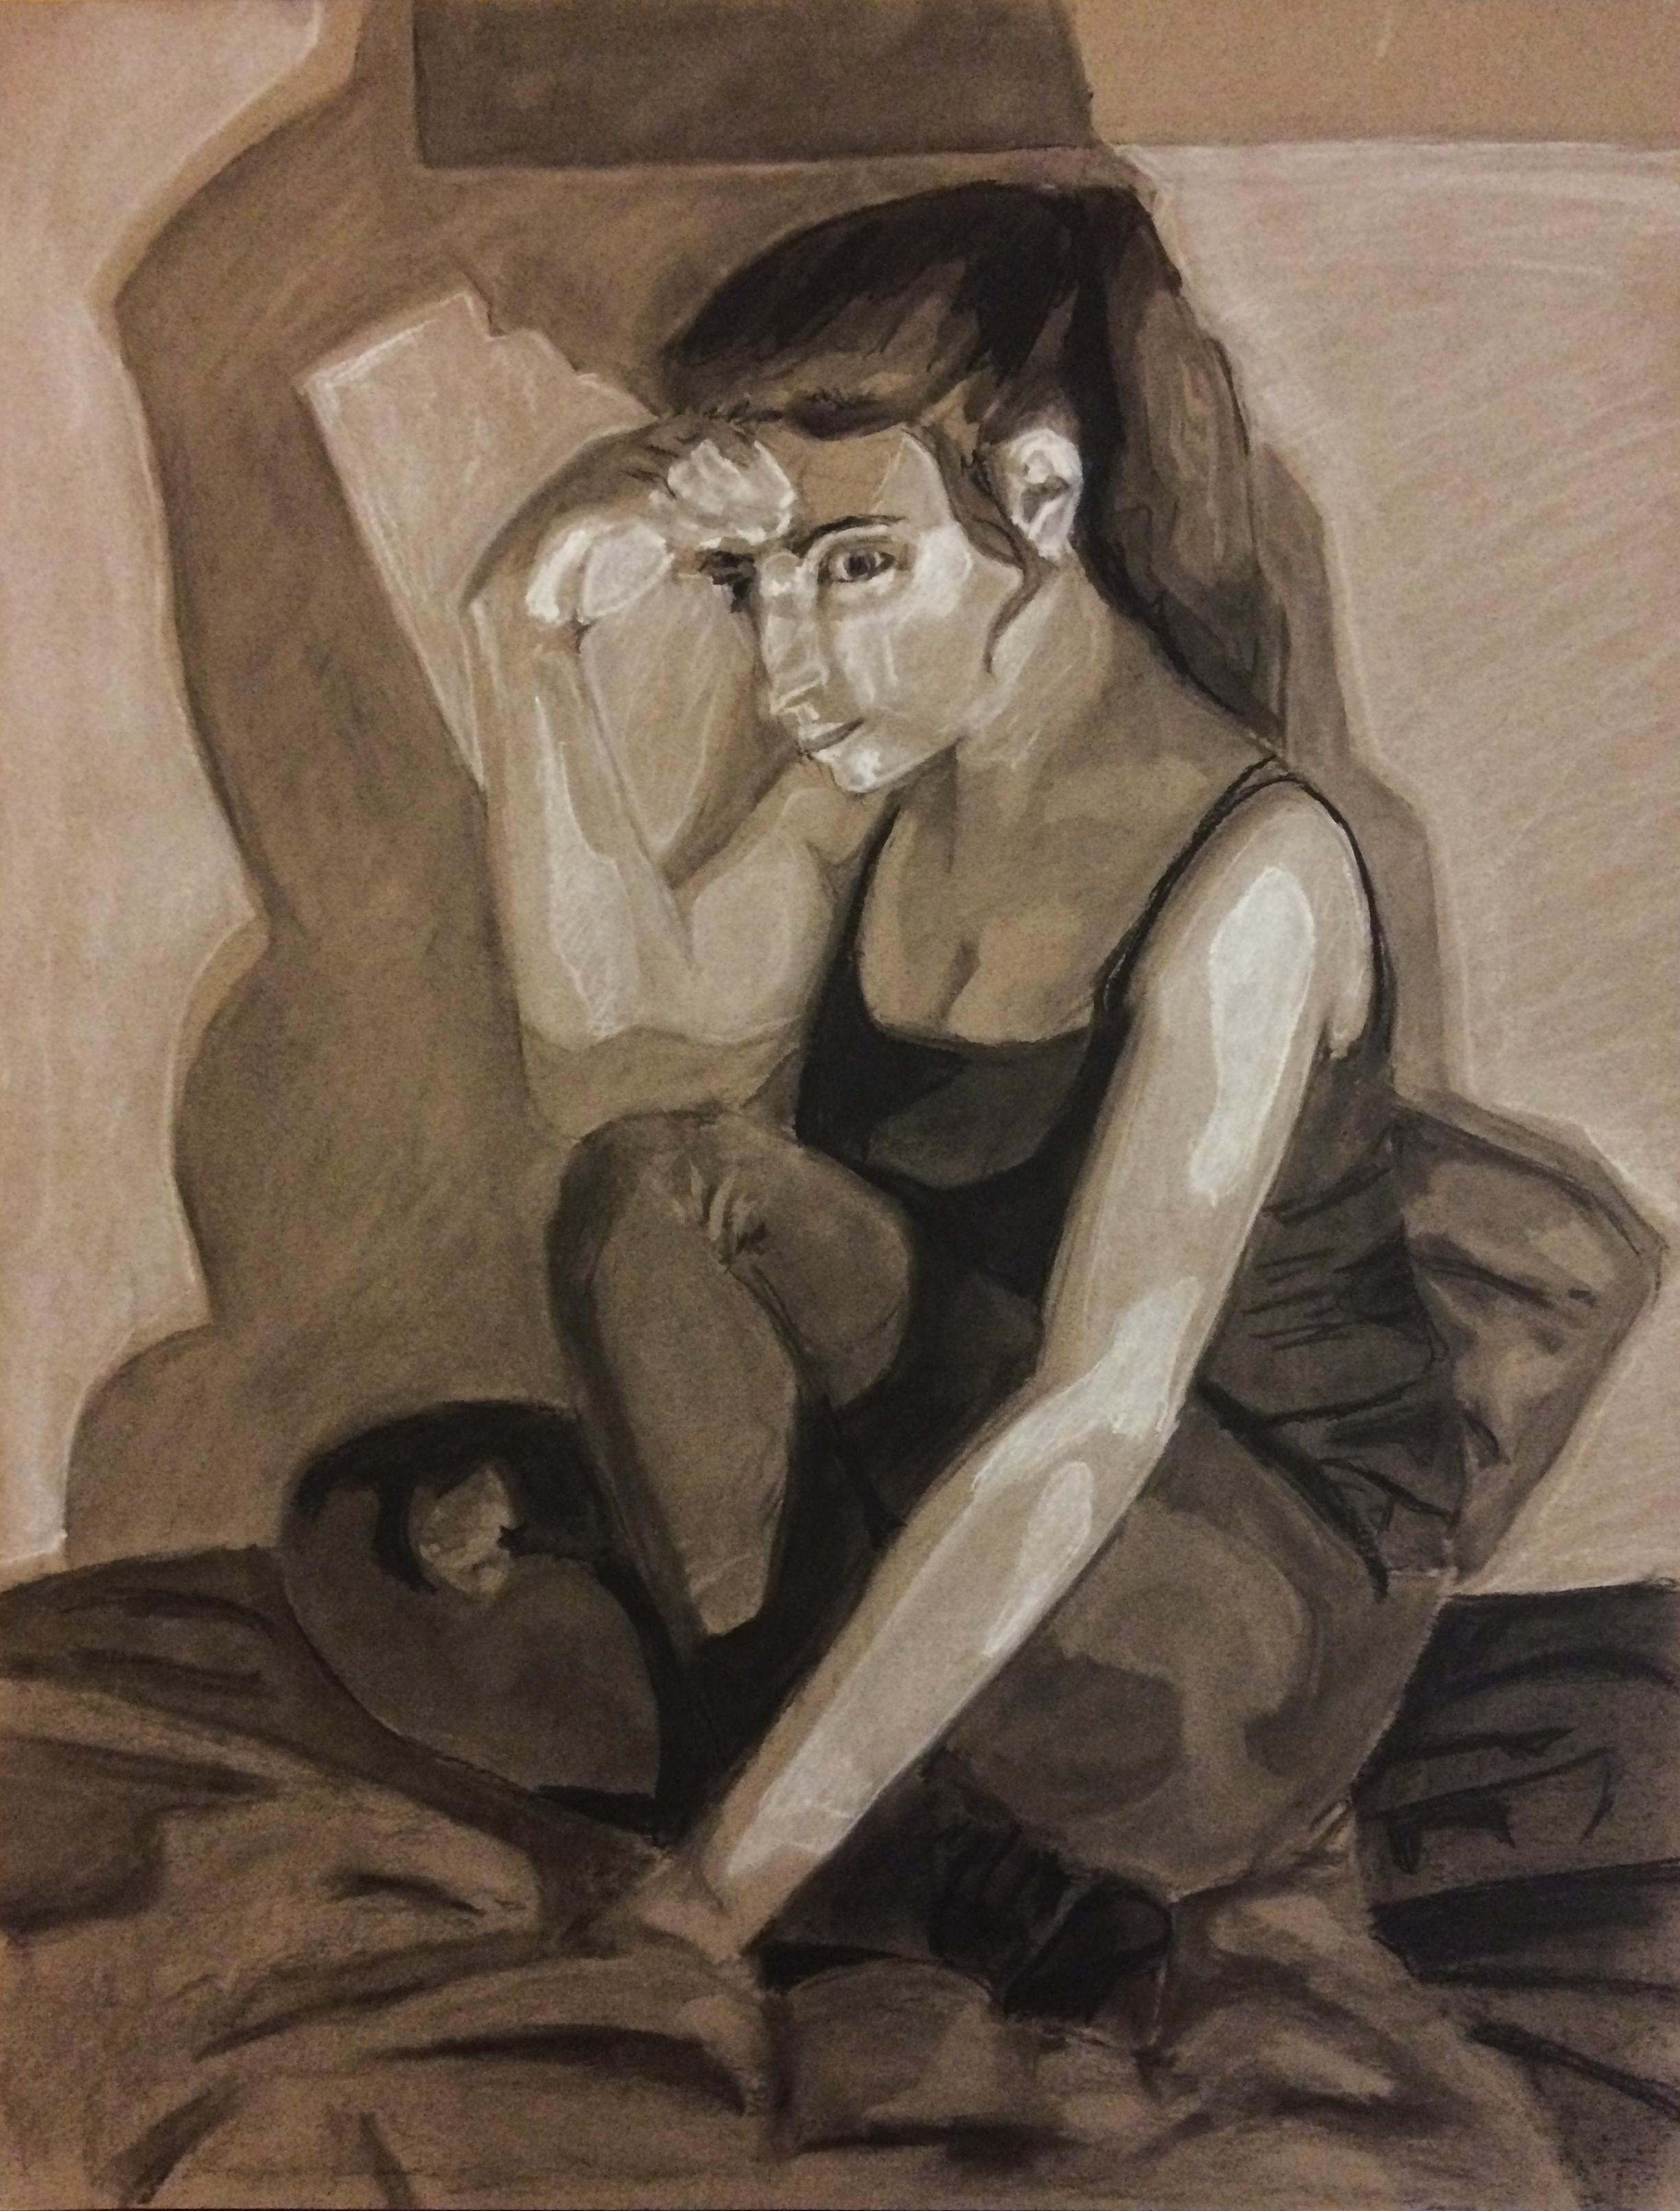 Anxiety by Failure